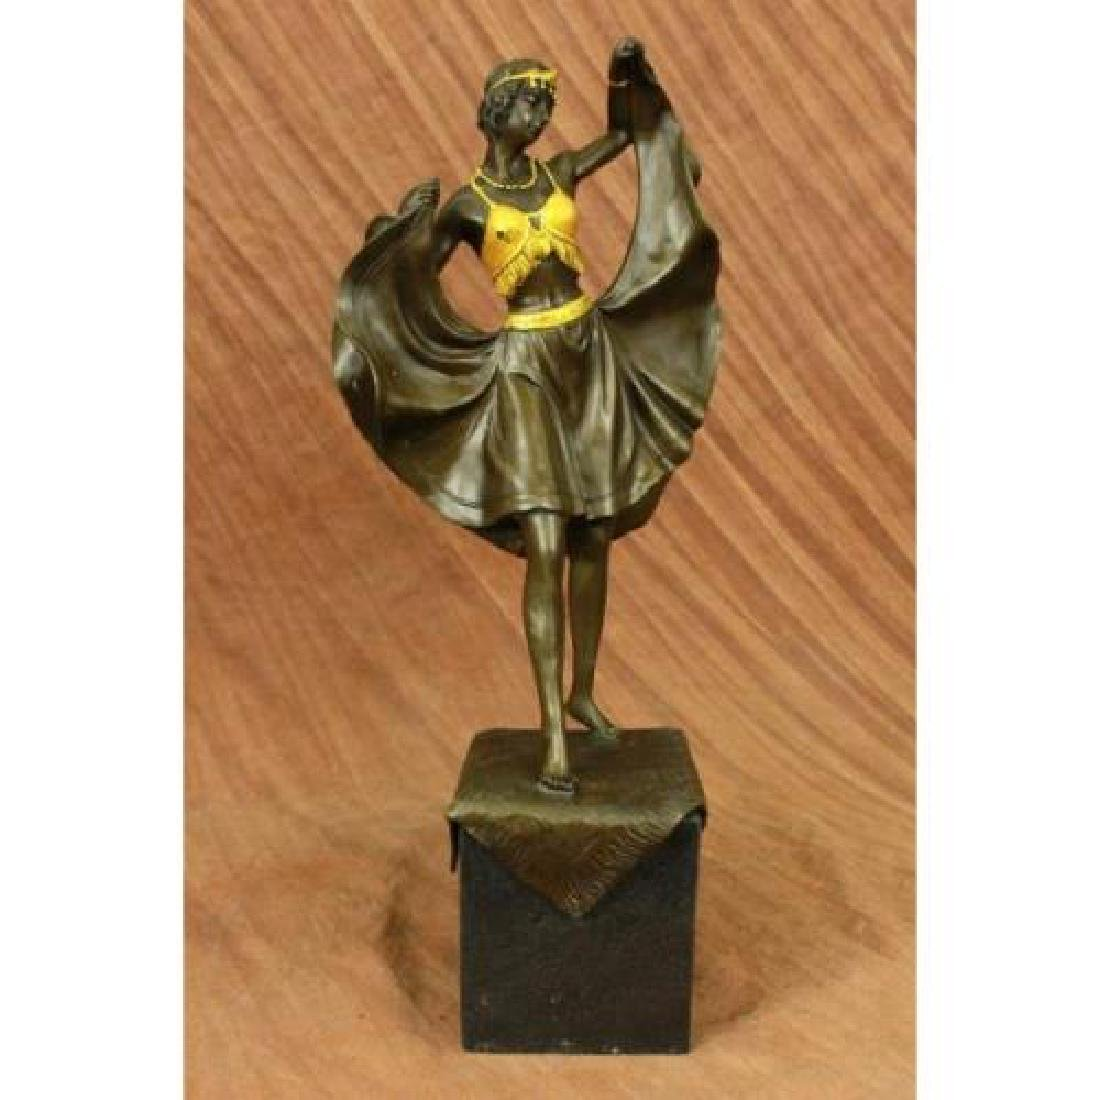 Arabian Girl With Lifting Skirt on Rug Bronze Sculpture